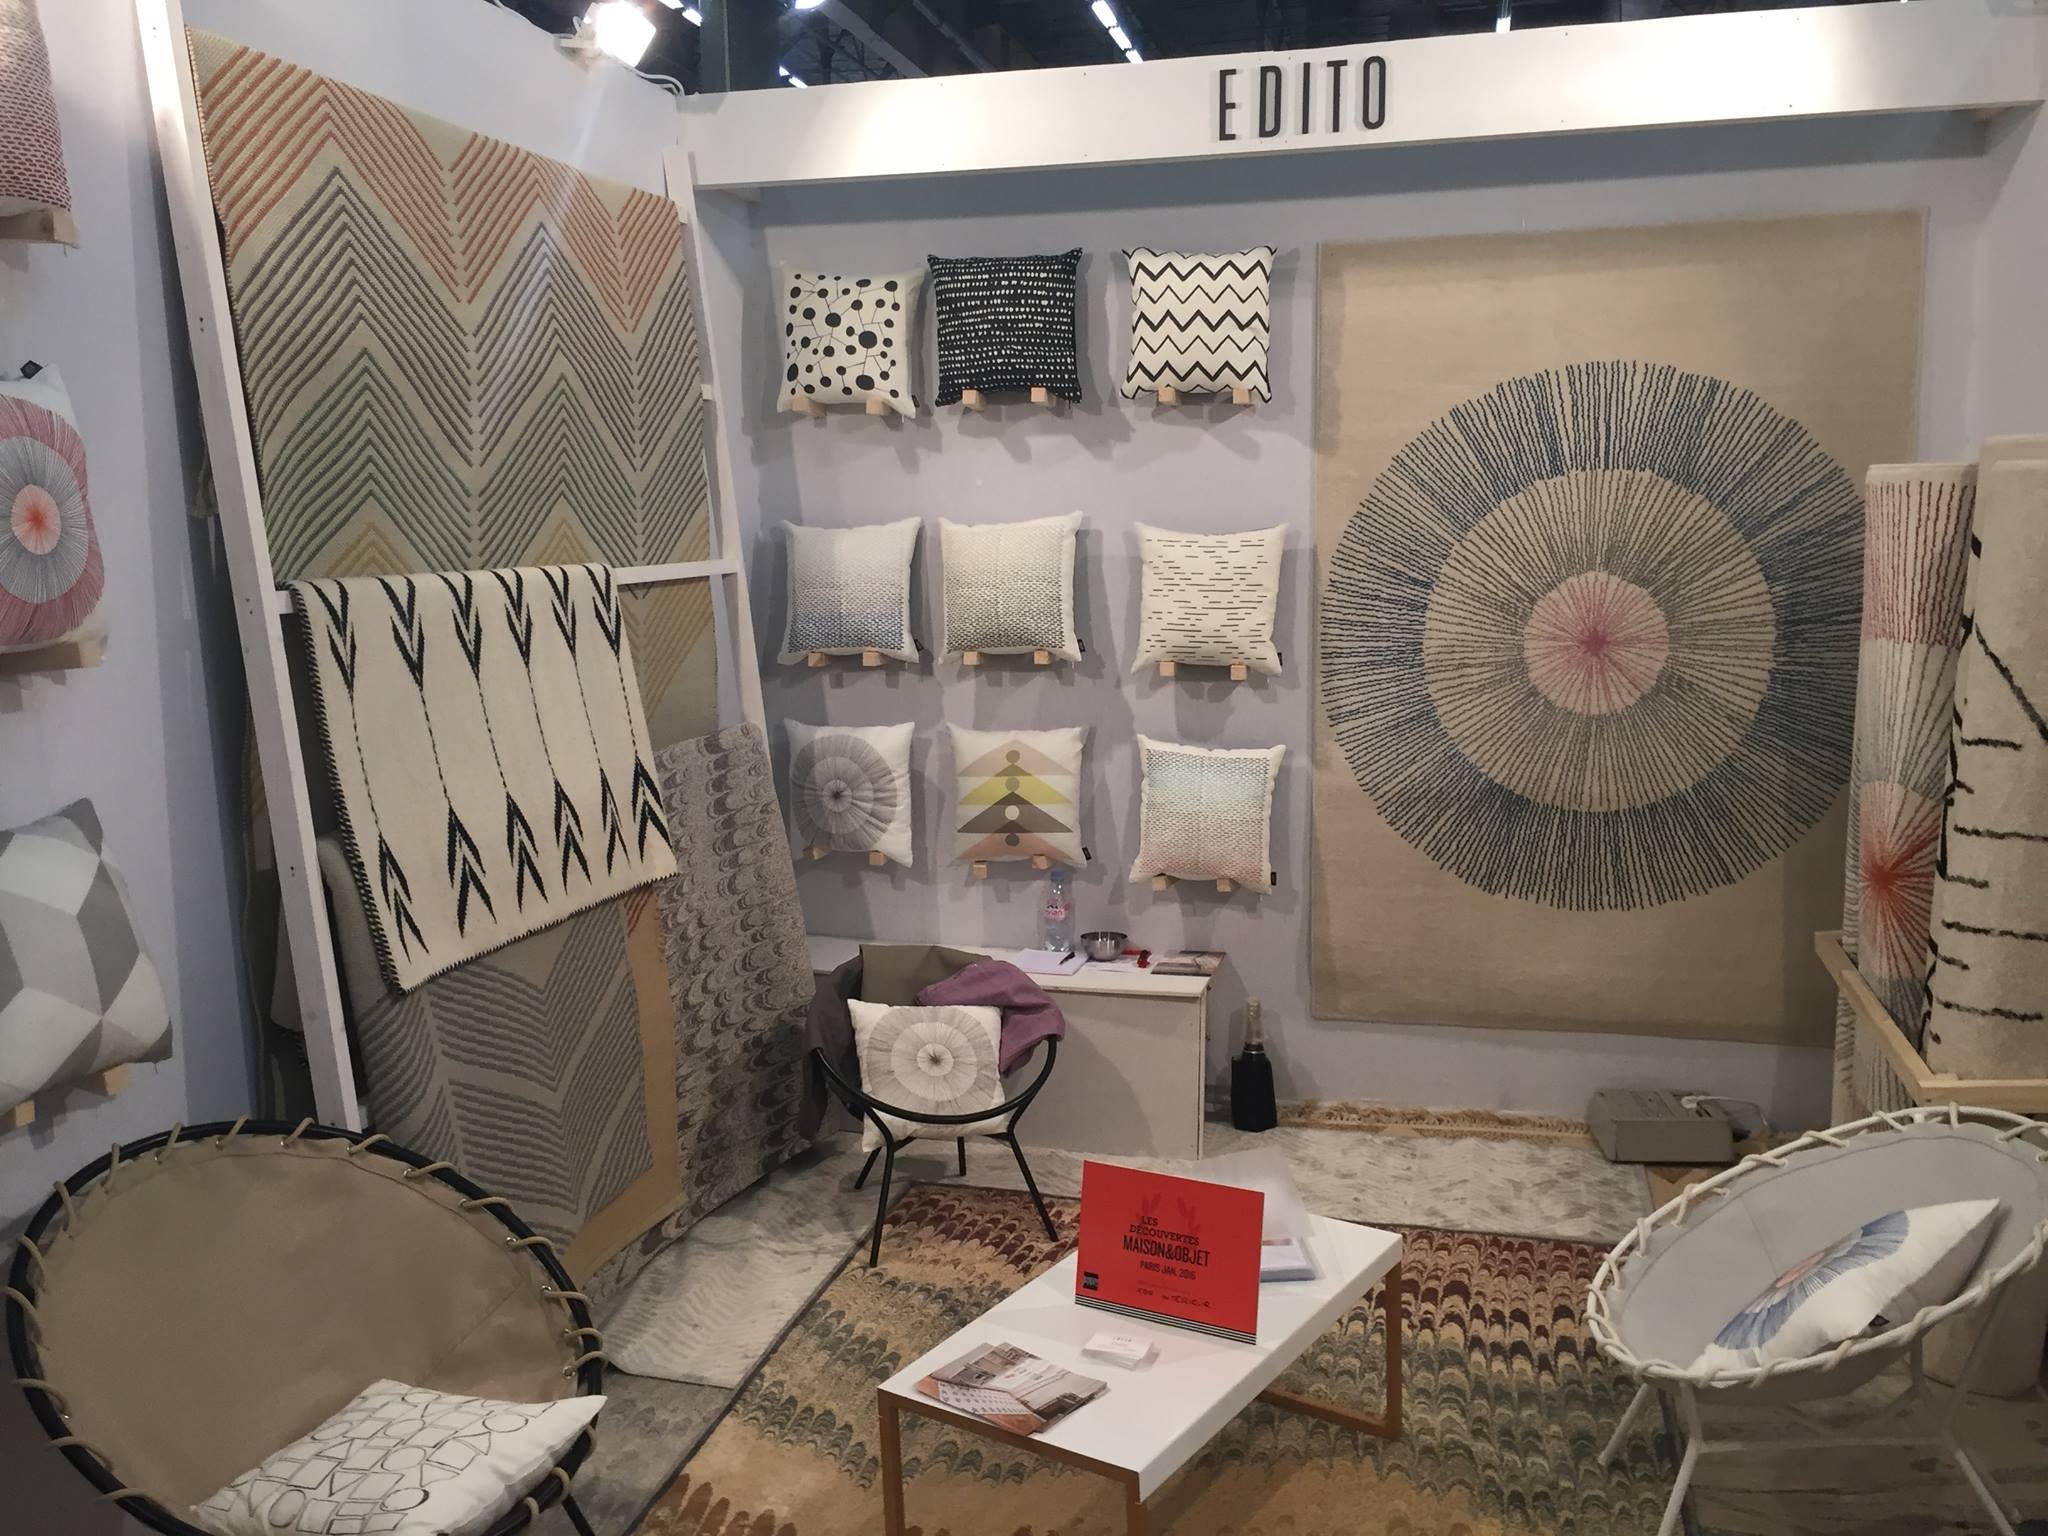 edito-paris-tapis-graphiques-design par-chiara-stella-home10